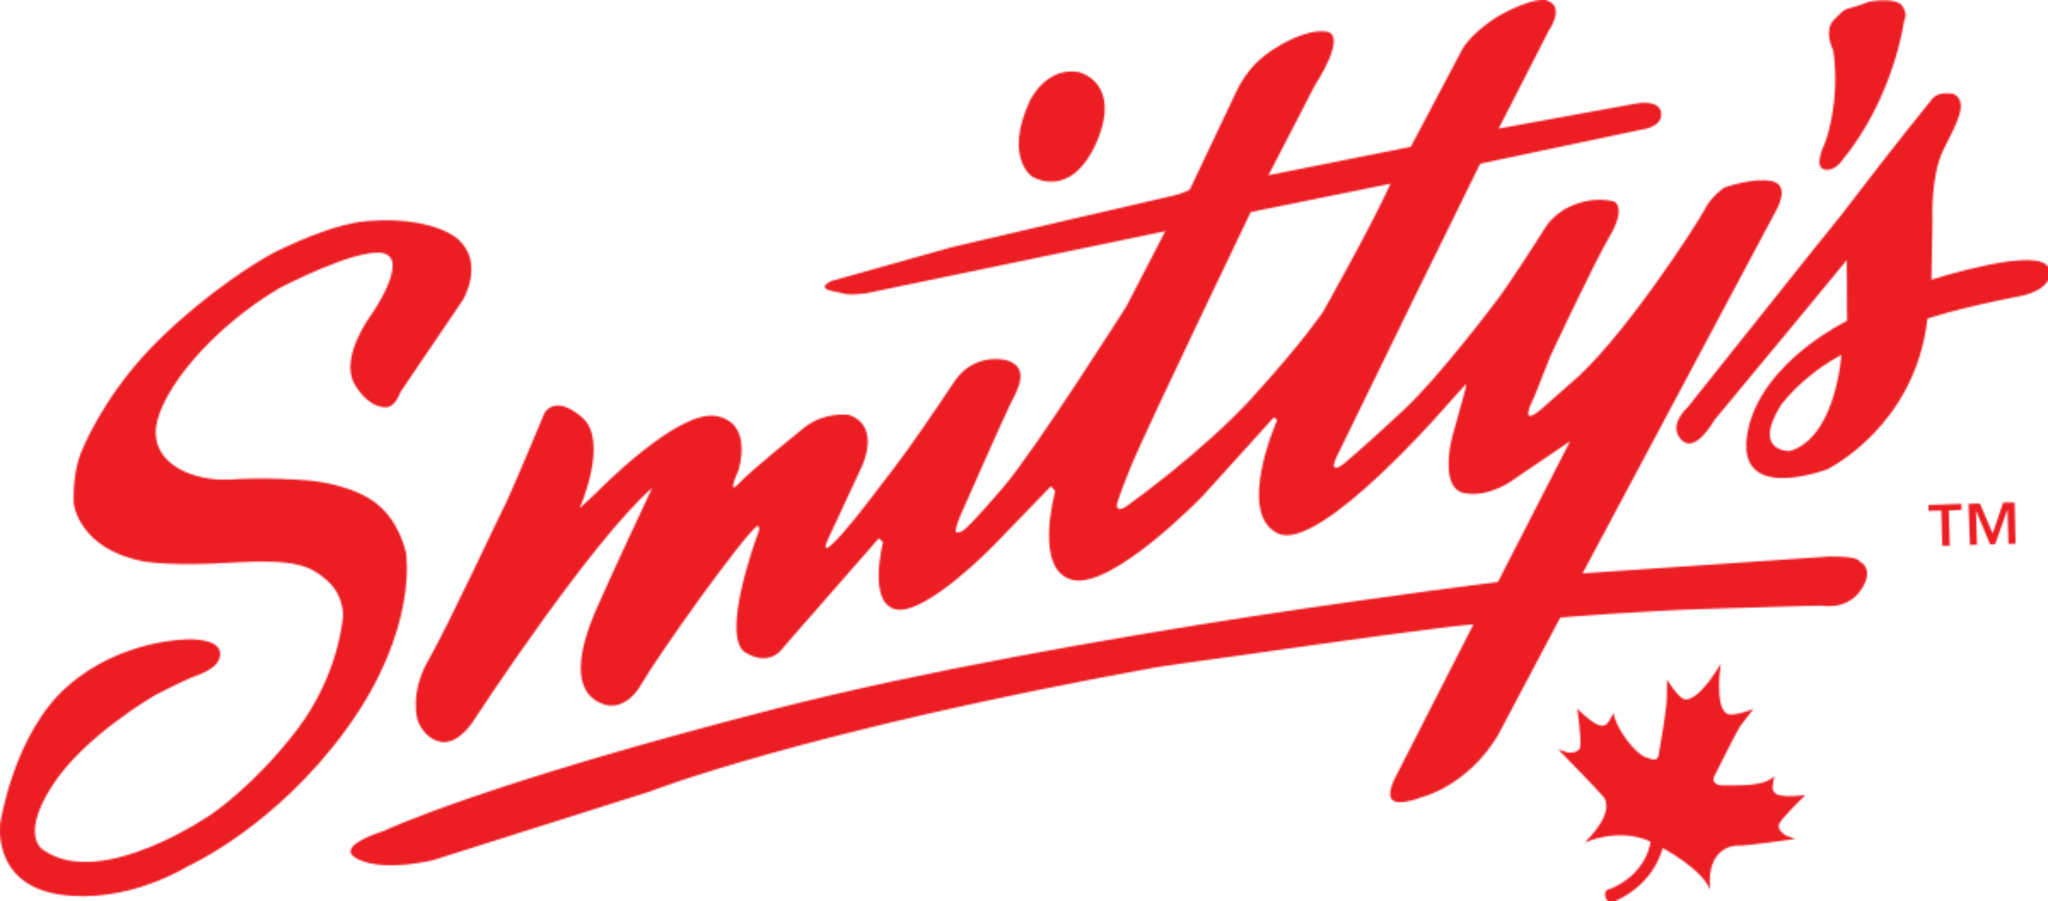 Smitty's Family Restaurant & Lounge